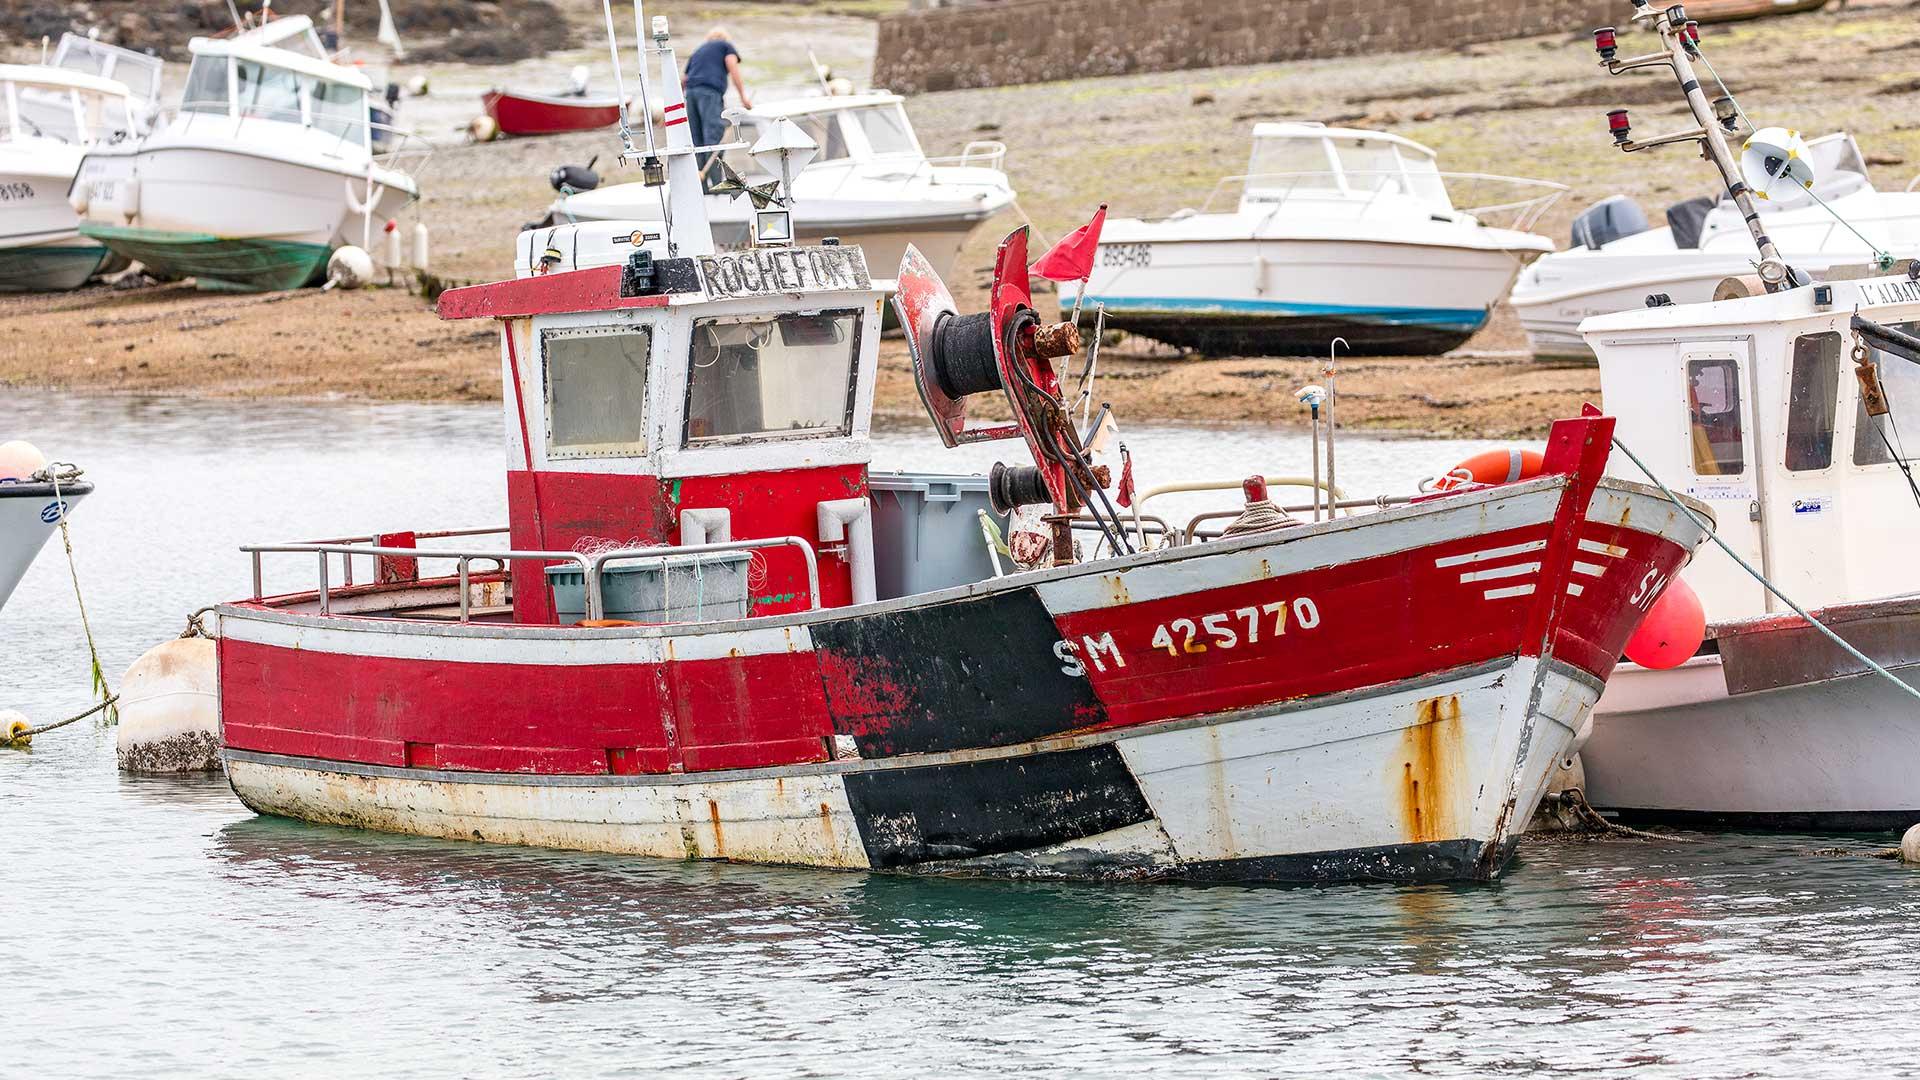 Landschaftsfotografie: Côte de Granit Rose – Rotes Boot im Hafen | Foto: Dieter Eikenberg, imprints